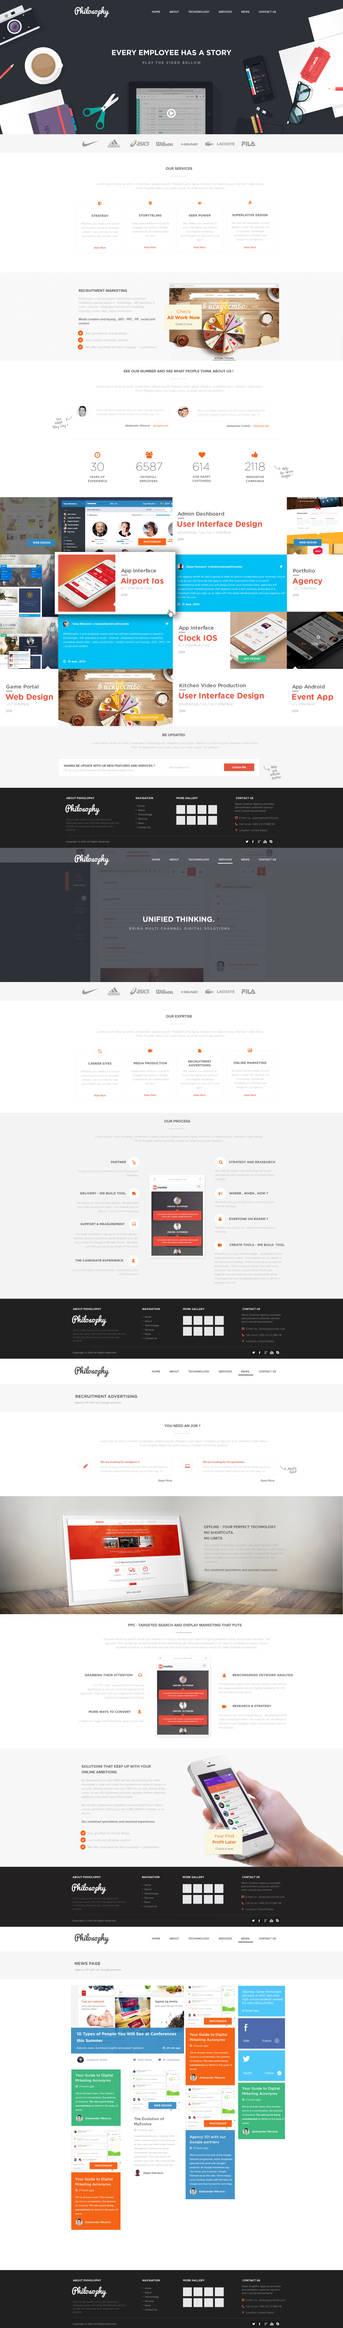 Branding Agency Web Design